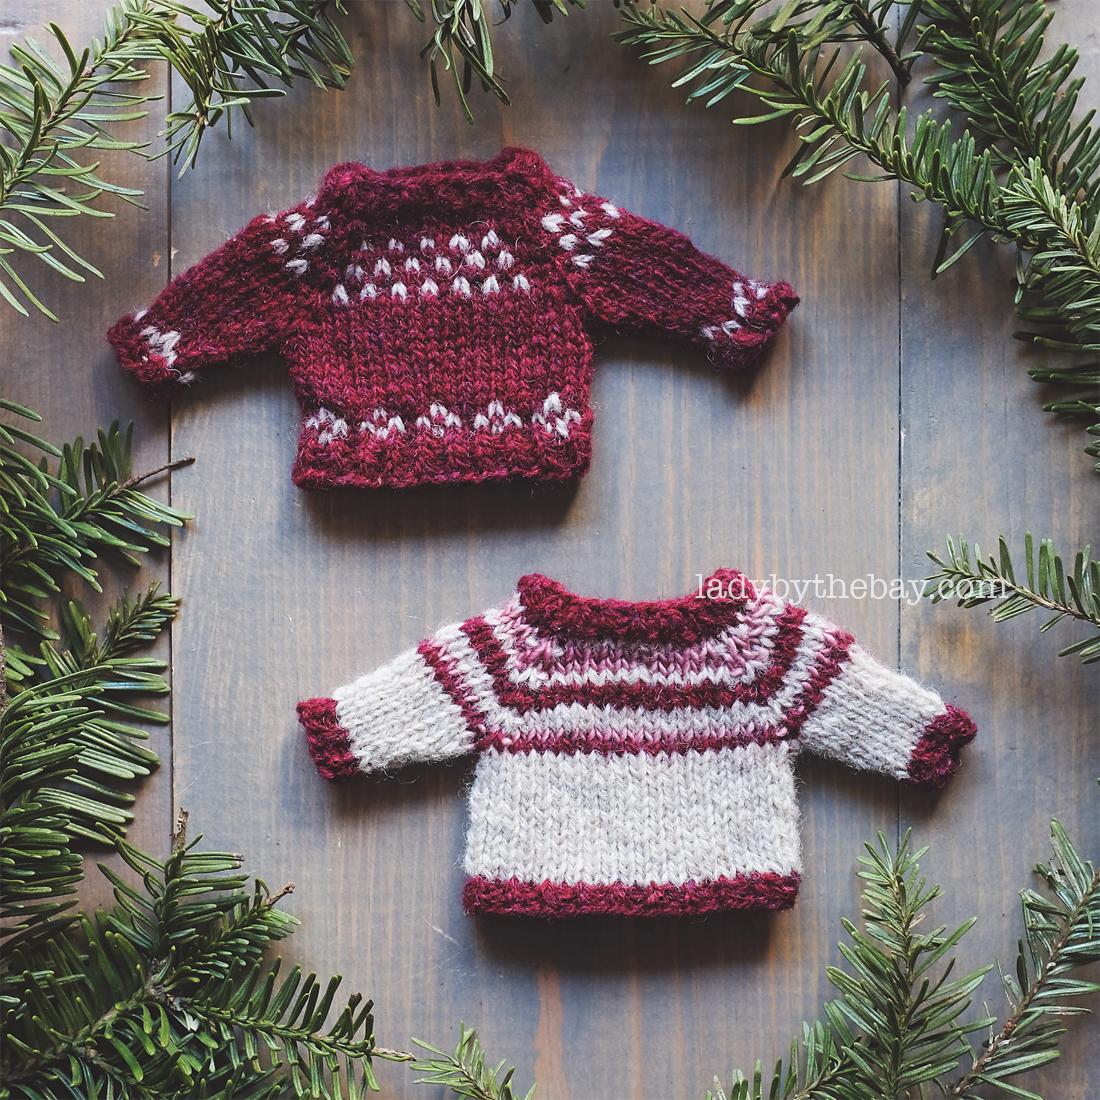 Ladybythebay-Tiny Sweaters.jpg